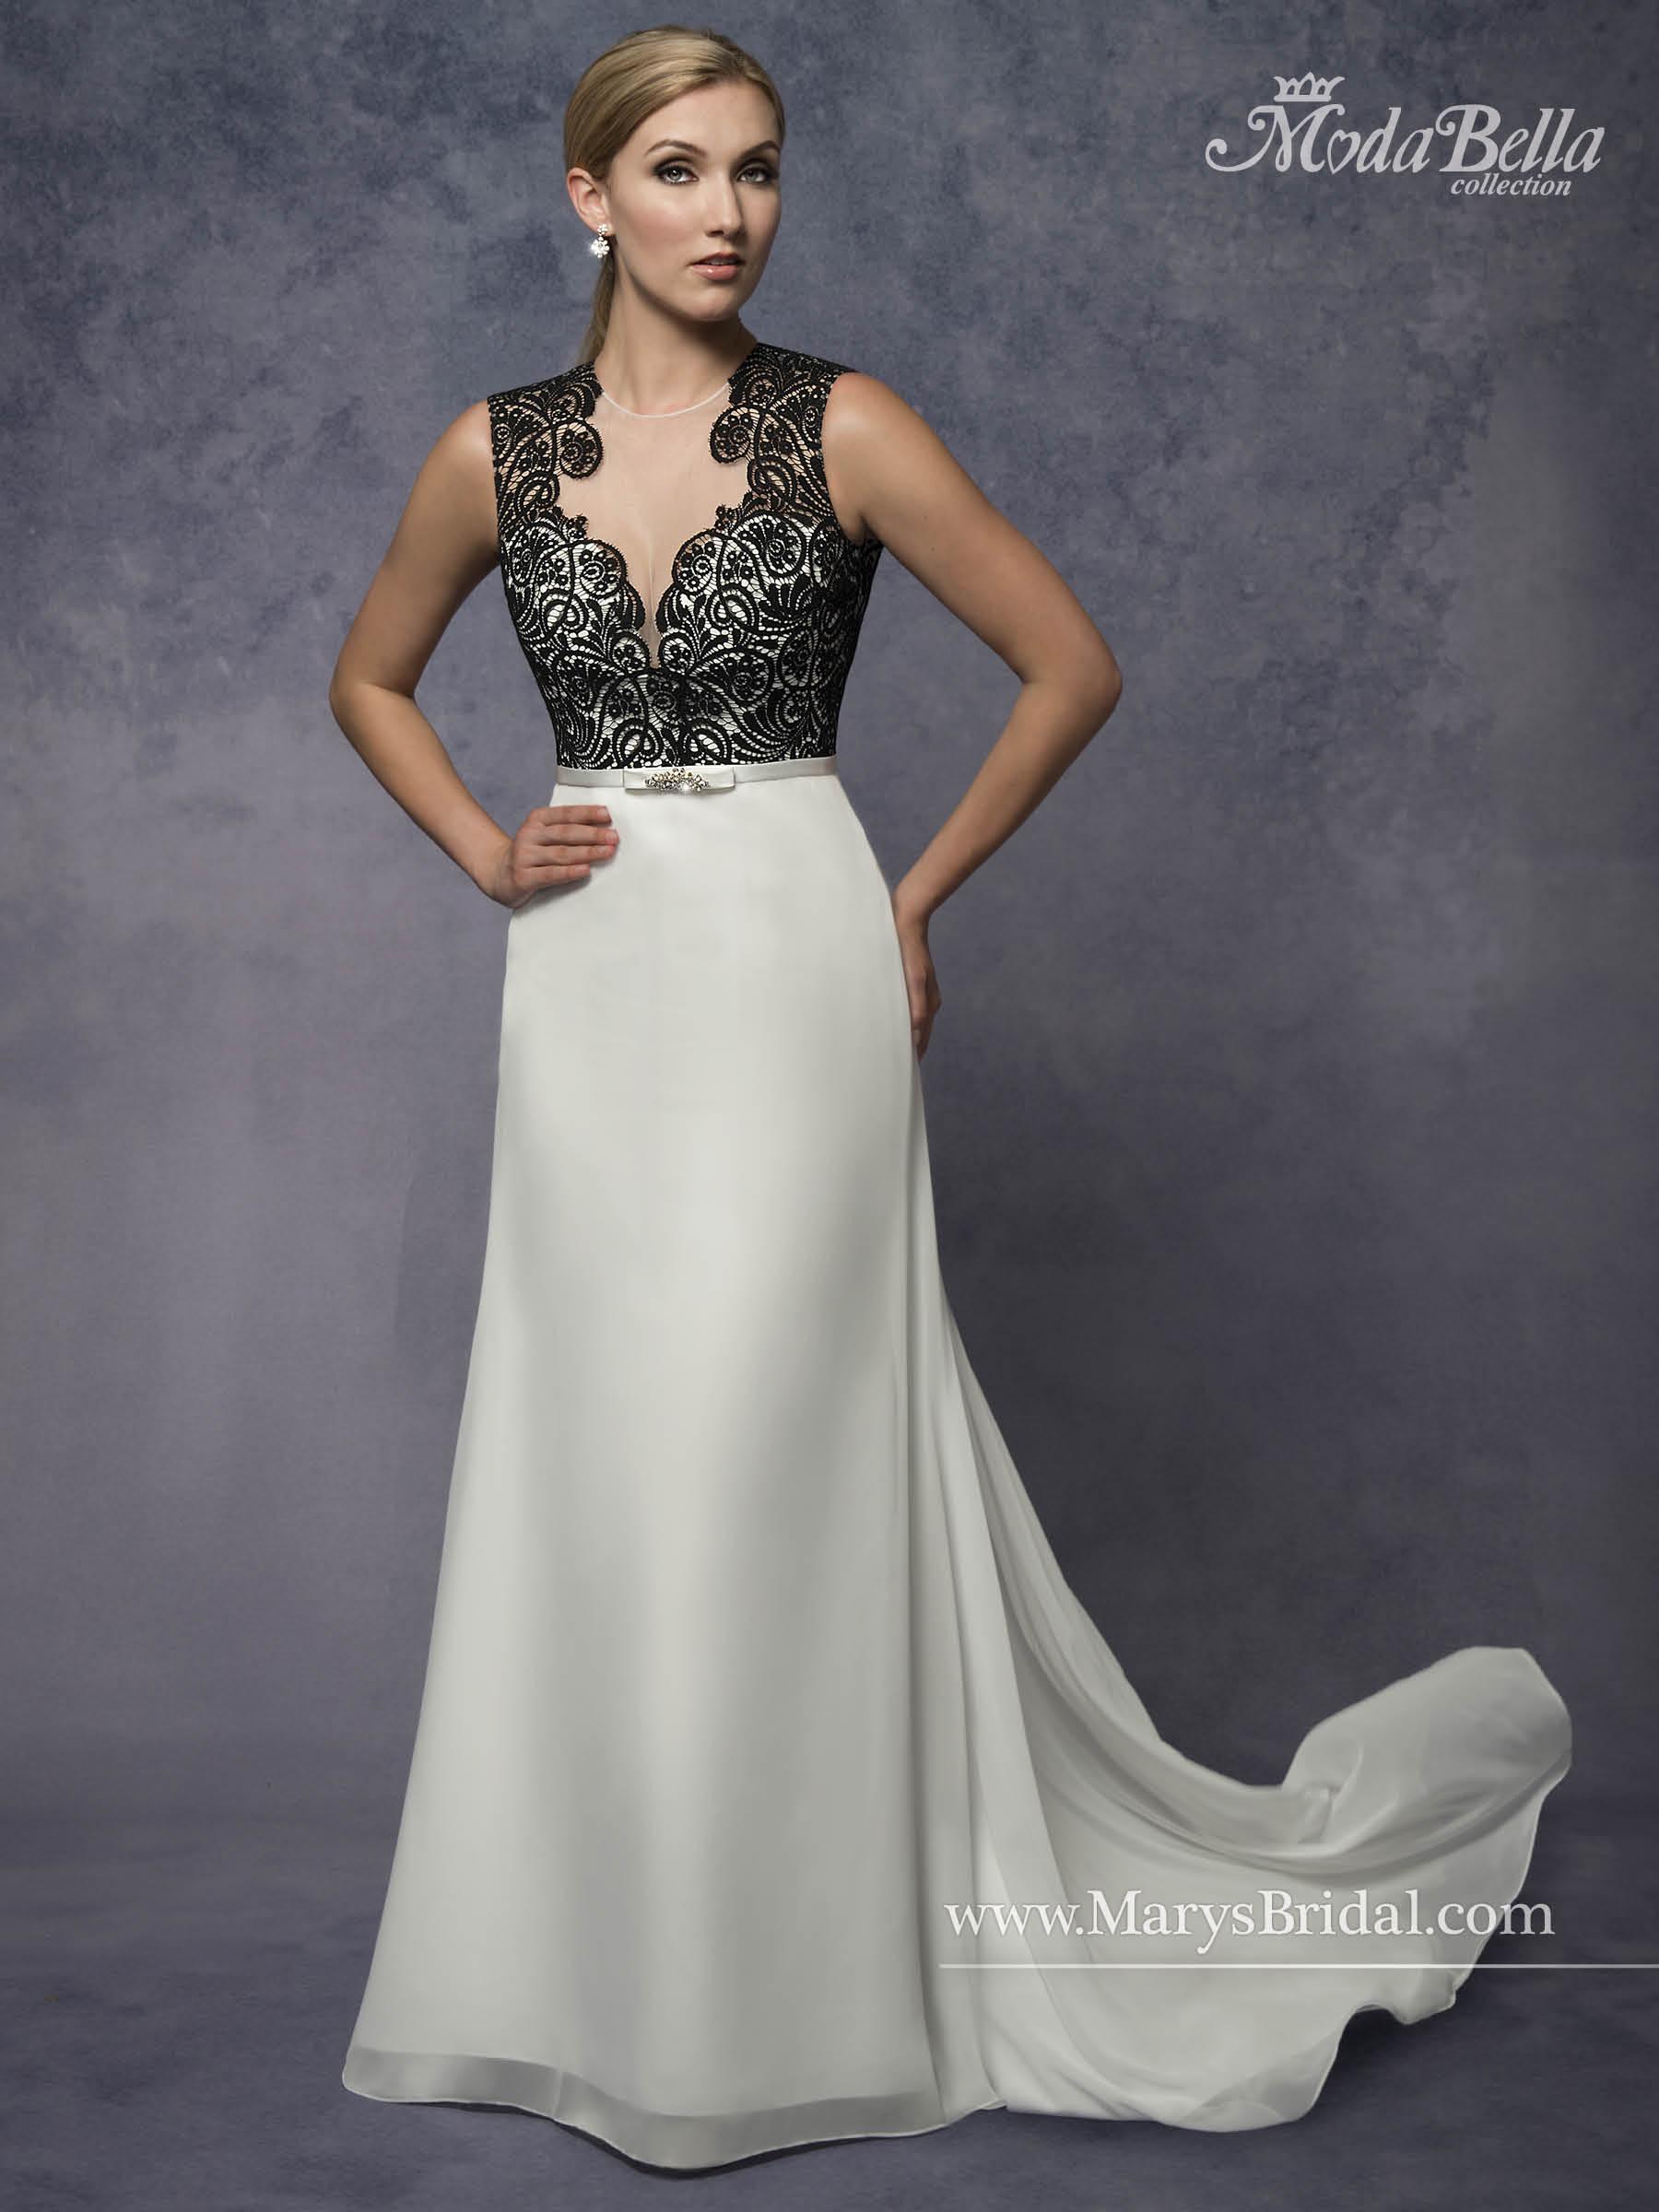 Bridal Dresses | Moda Bella | Style - 3Y690